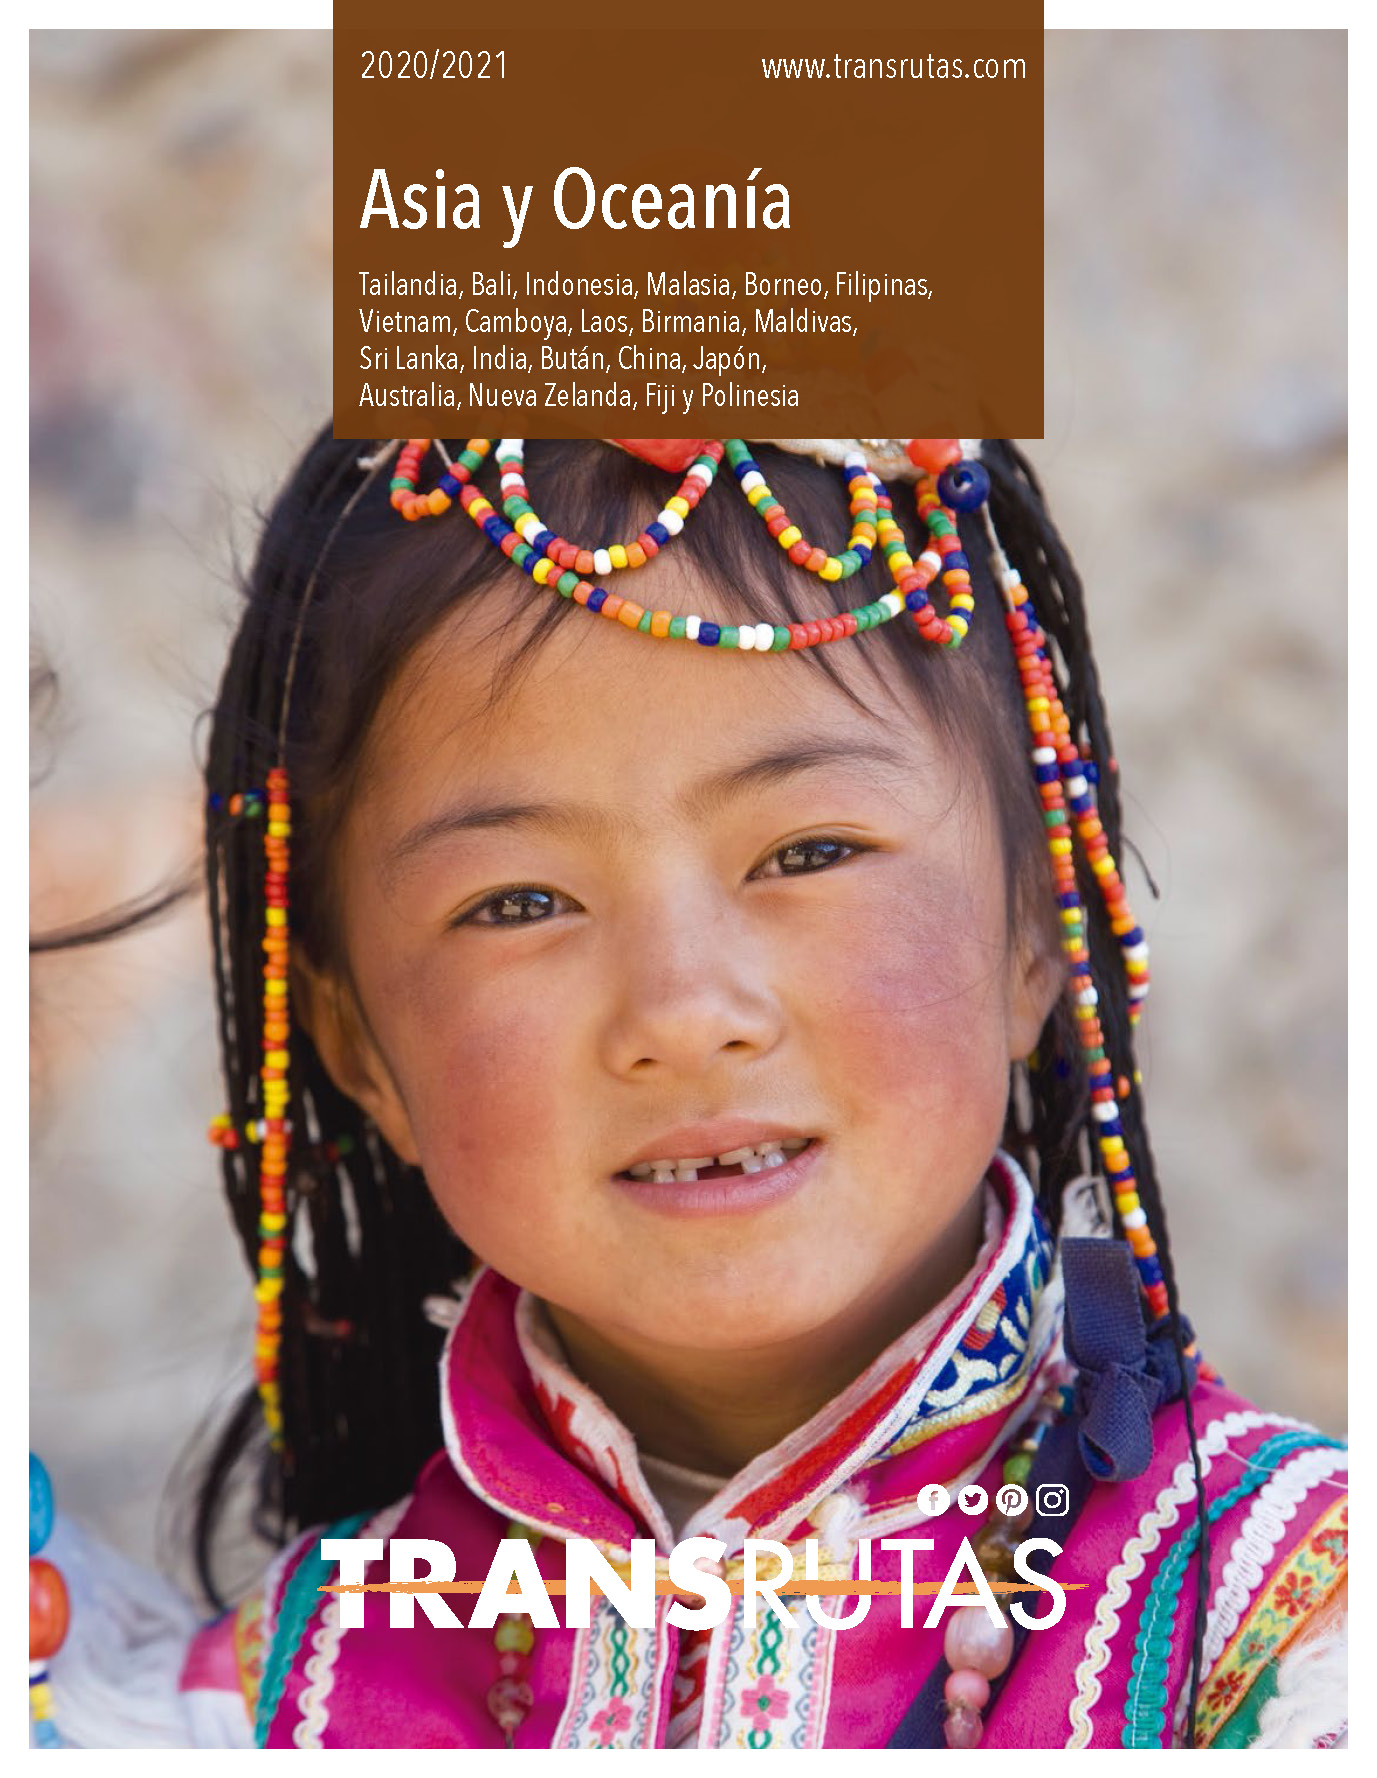 Catalogo Transrutas Asia y Oceania 2020-2021